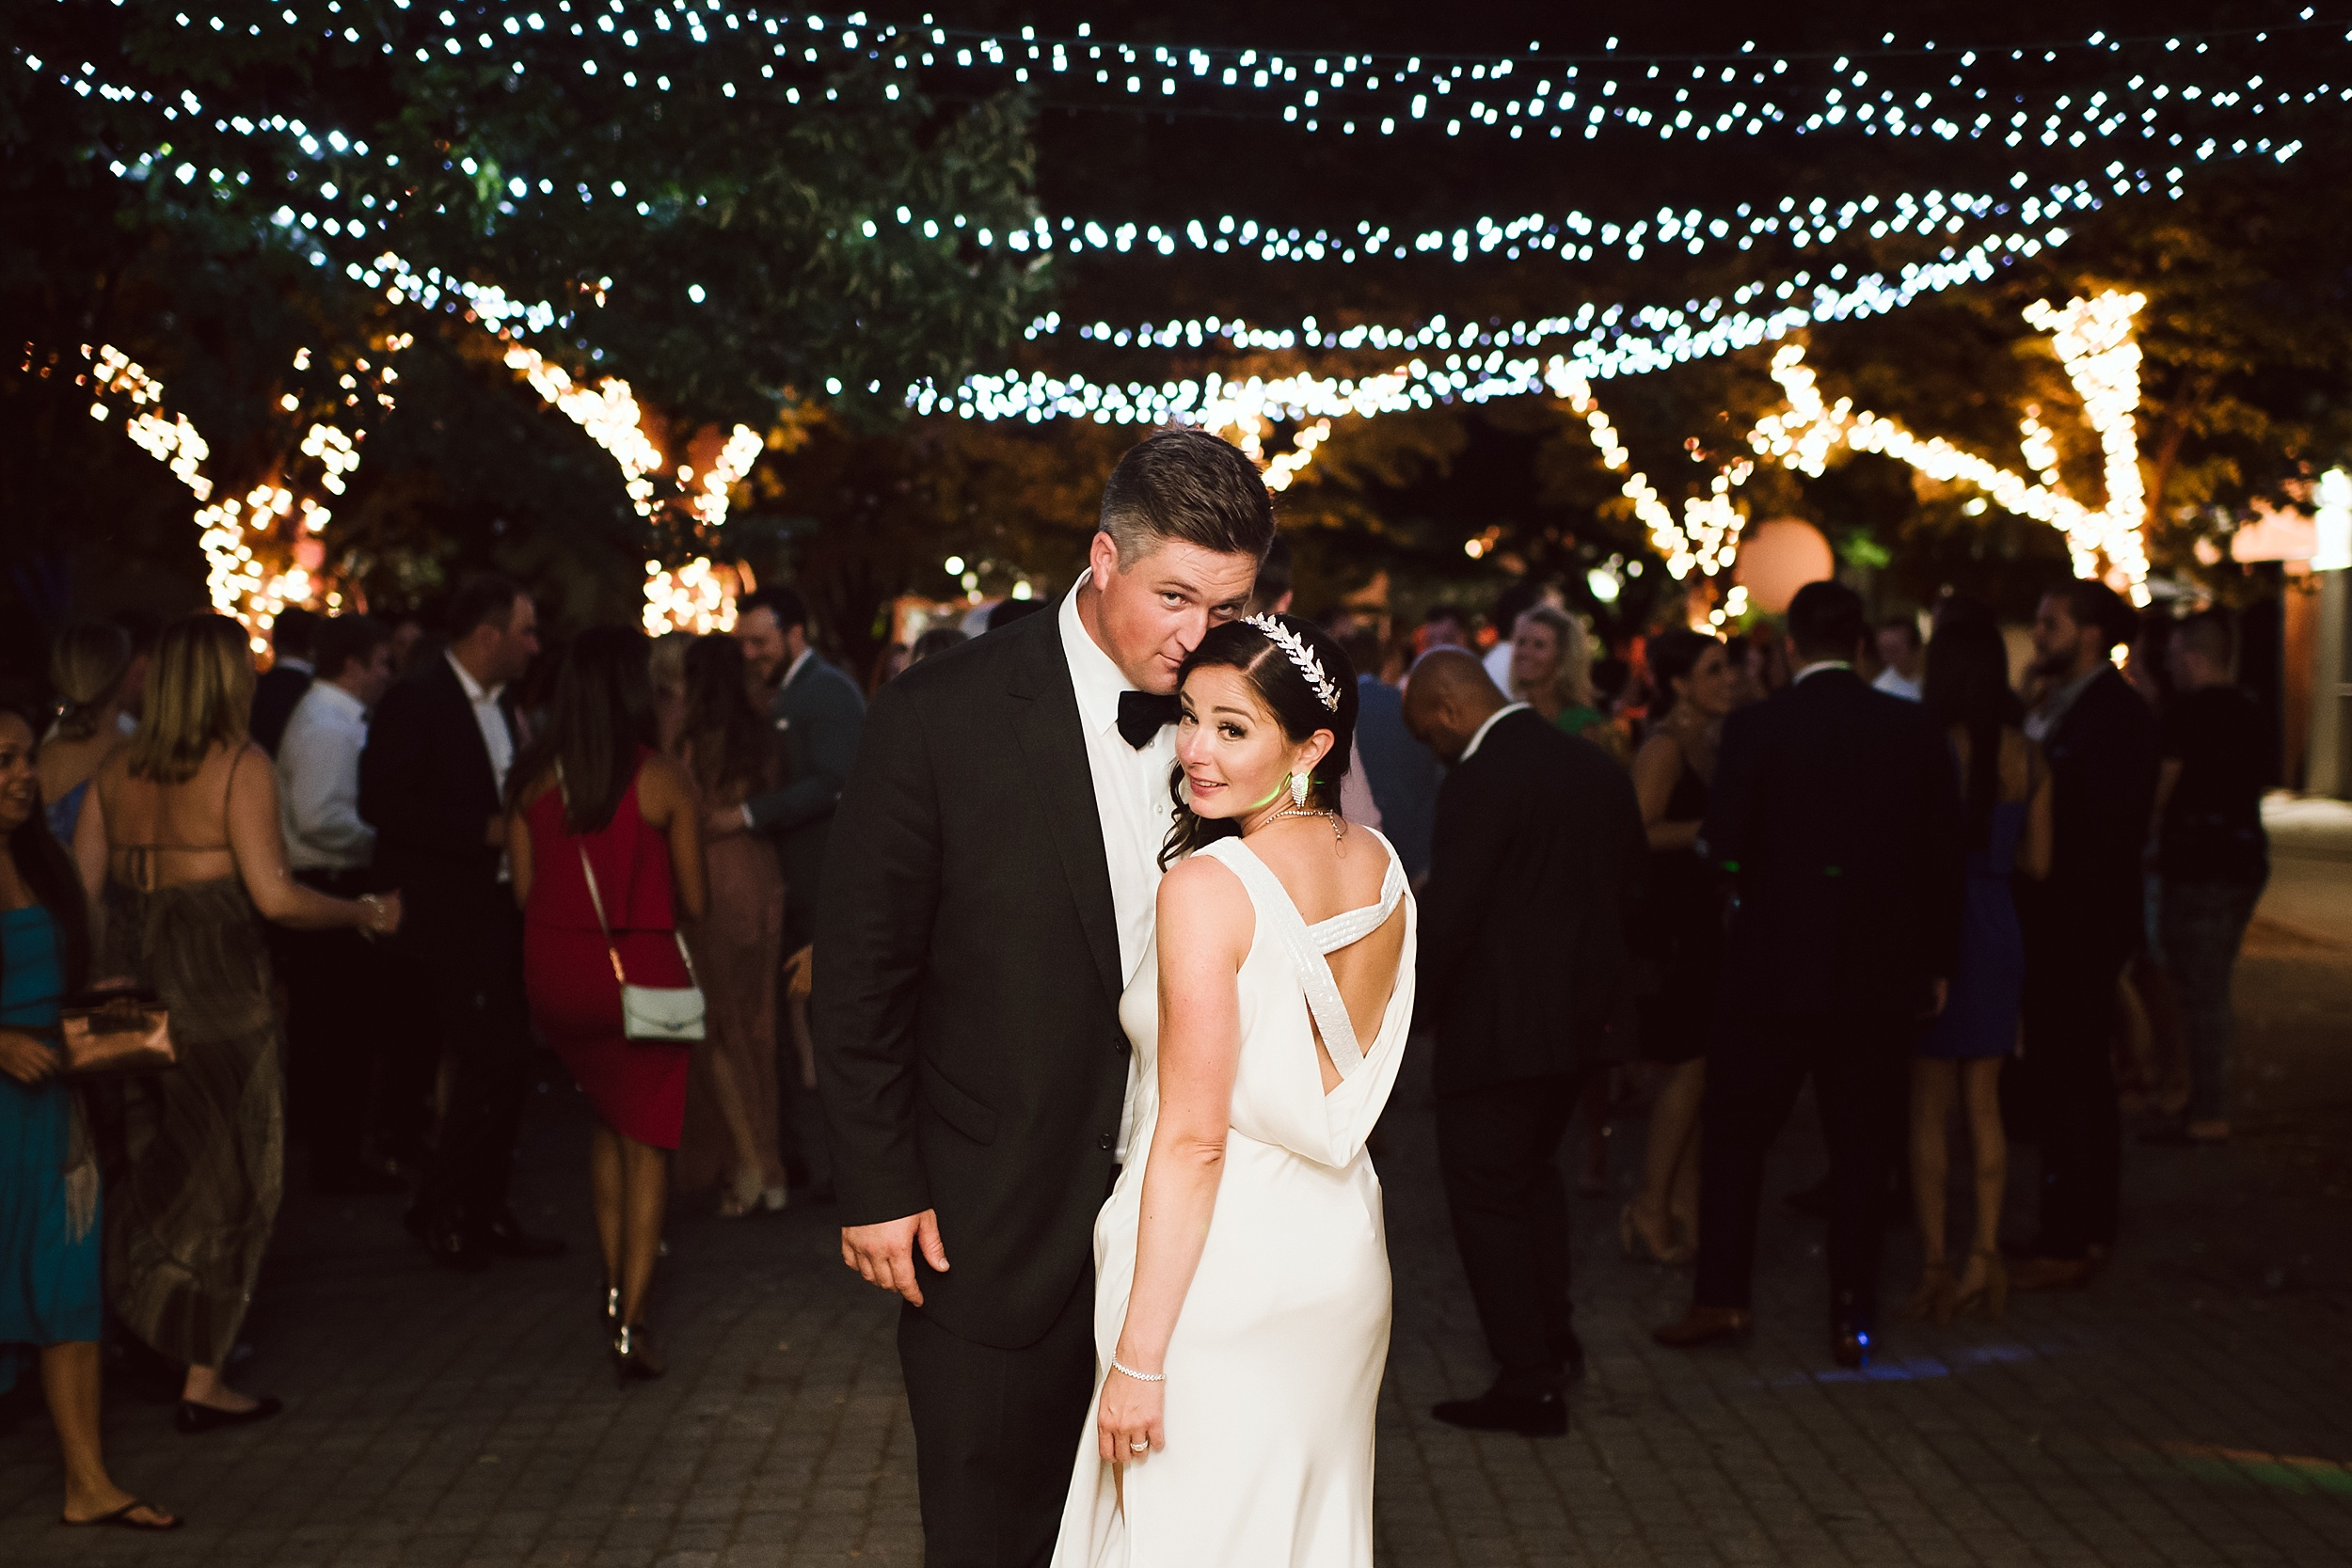 Sunnyside_Pavilion_Wedding_Toronto_Photographer_0135.jpg